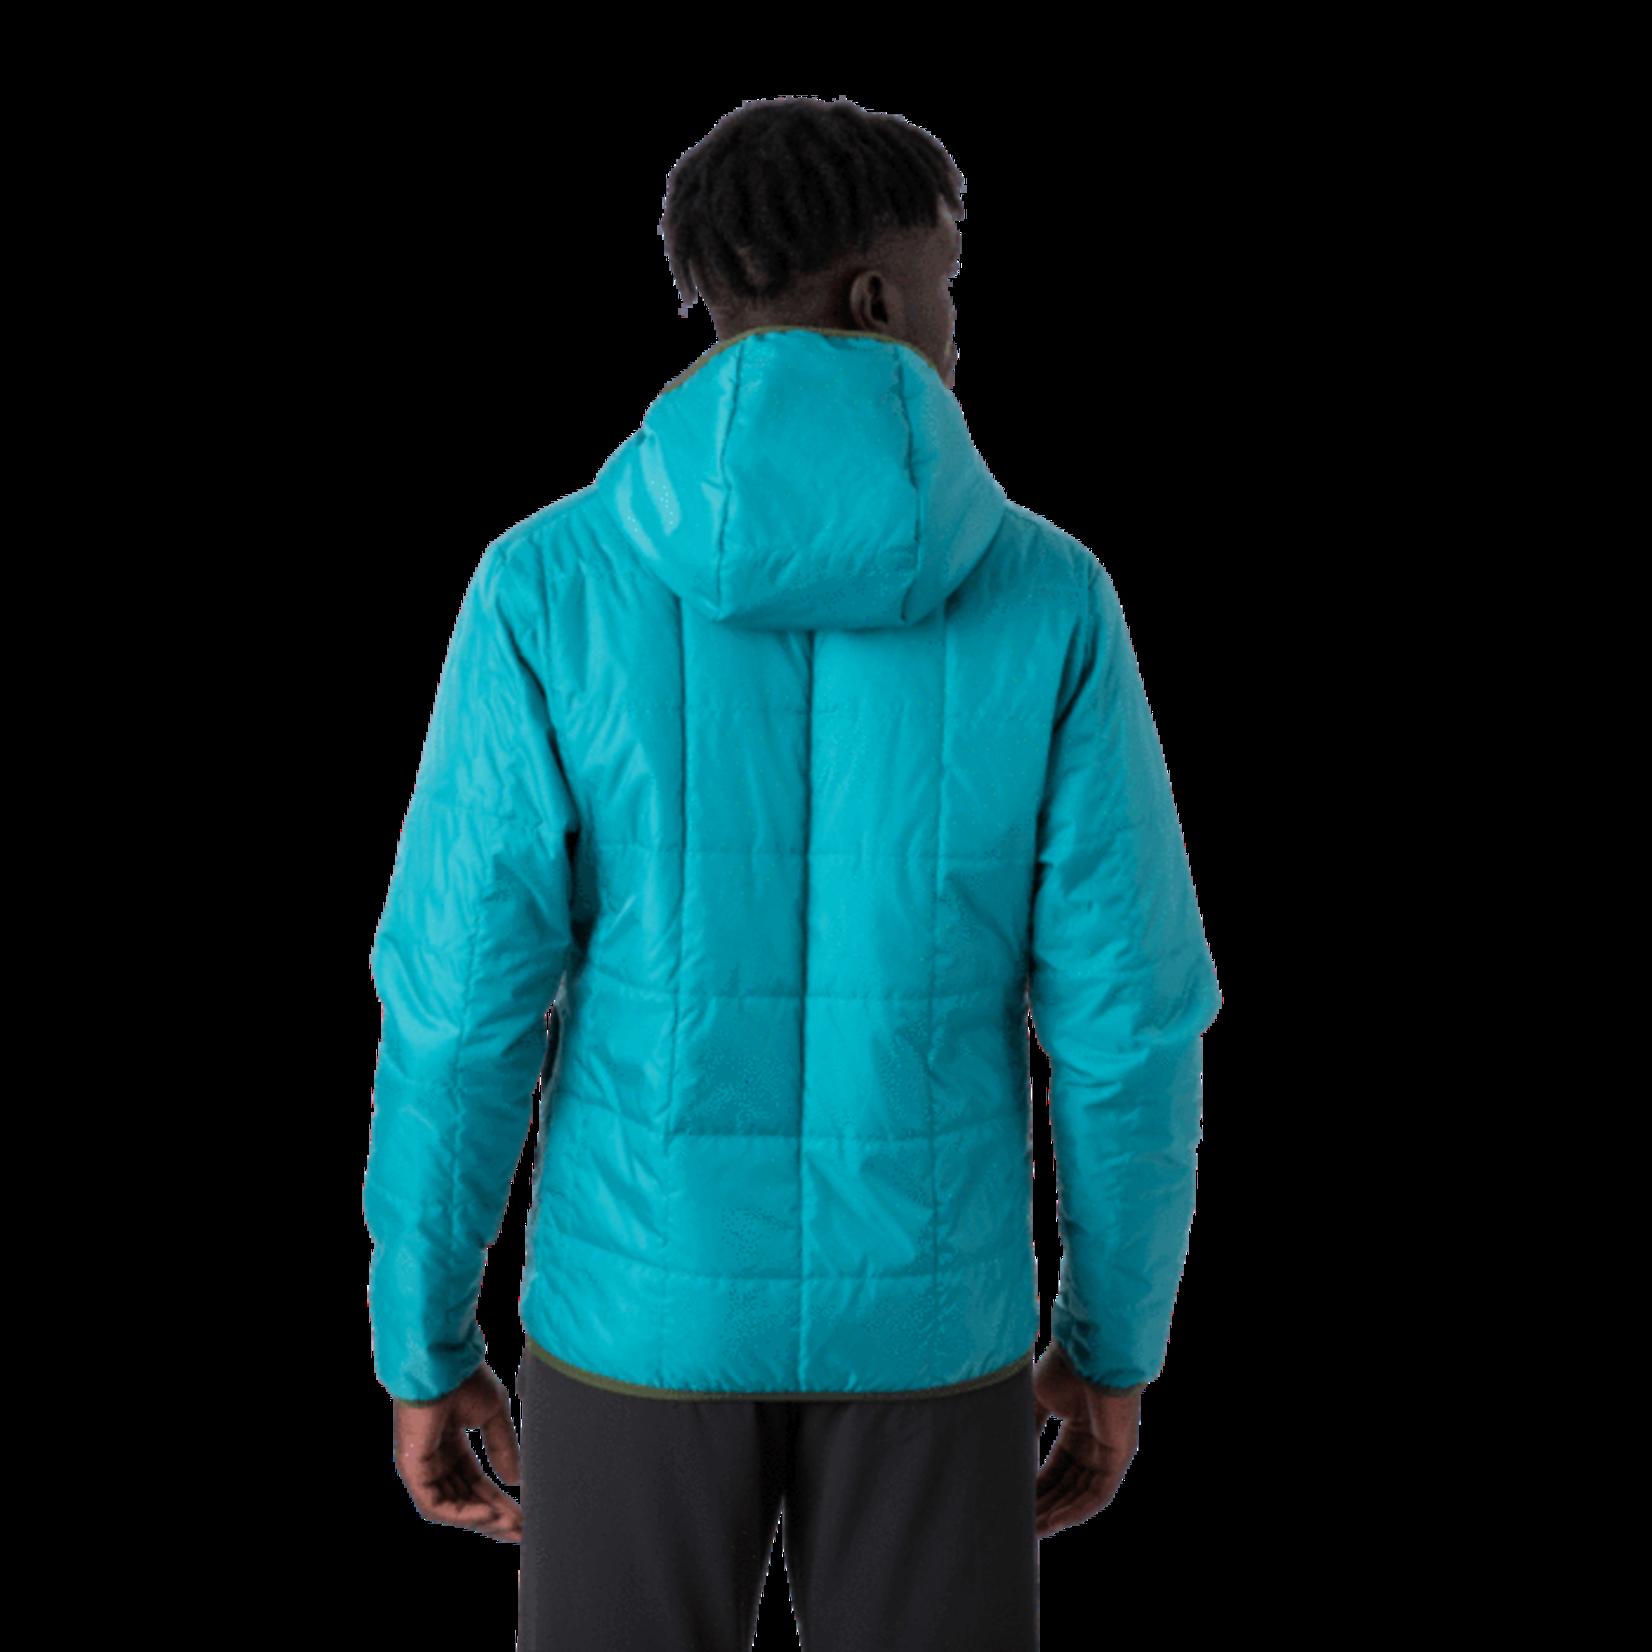 Cotopaxi Cotopaxi Teca Calido Hooded Jacket